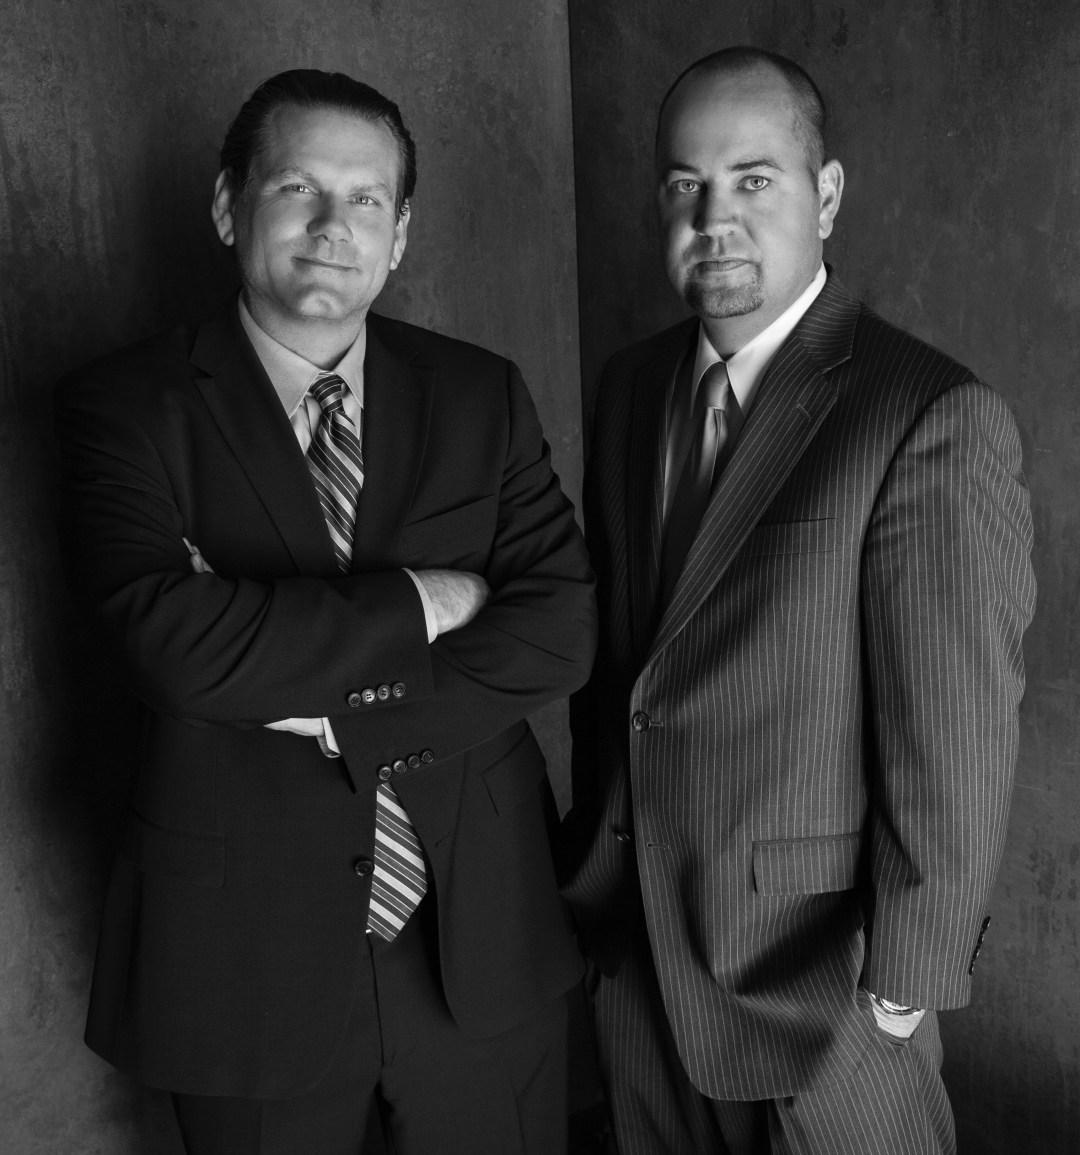 attorney photo shoot las vegas